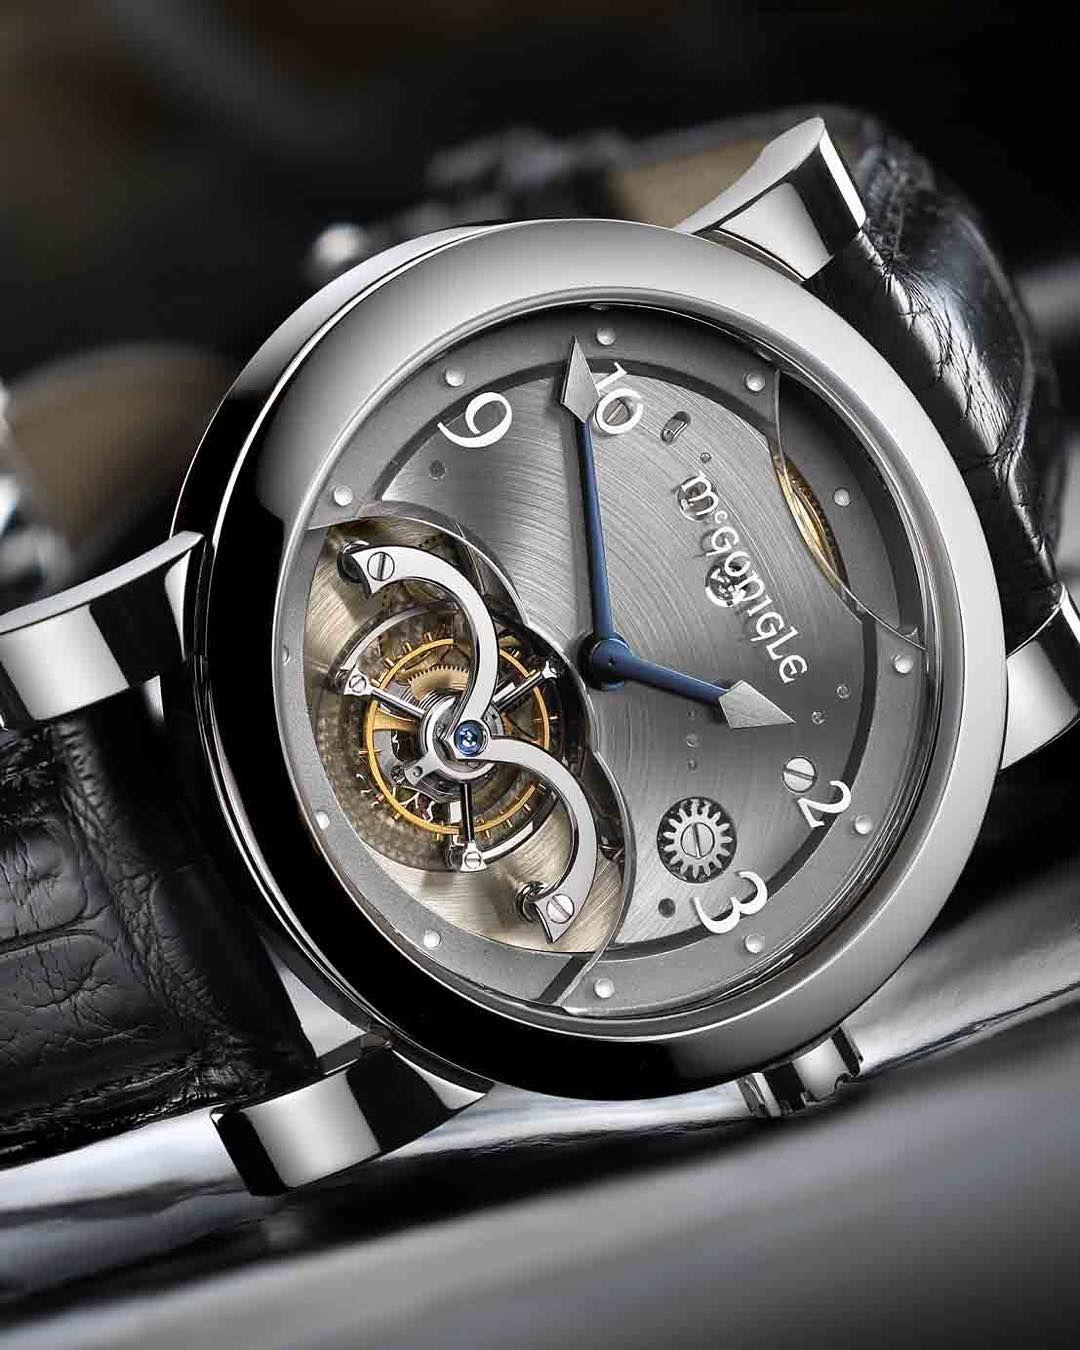 Mcgonigle watches - 2